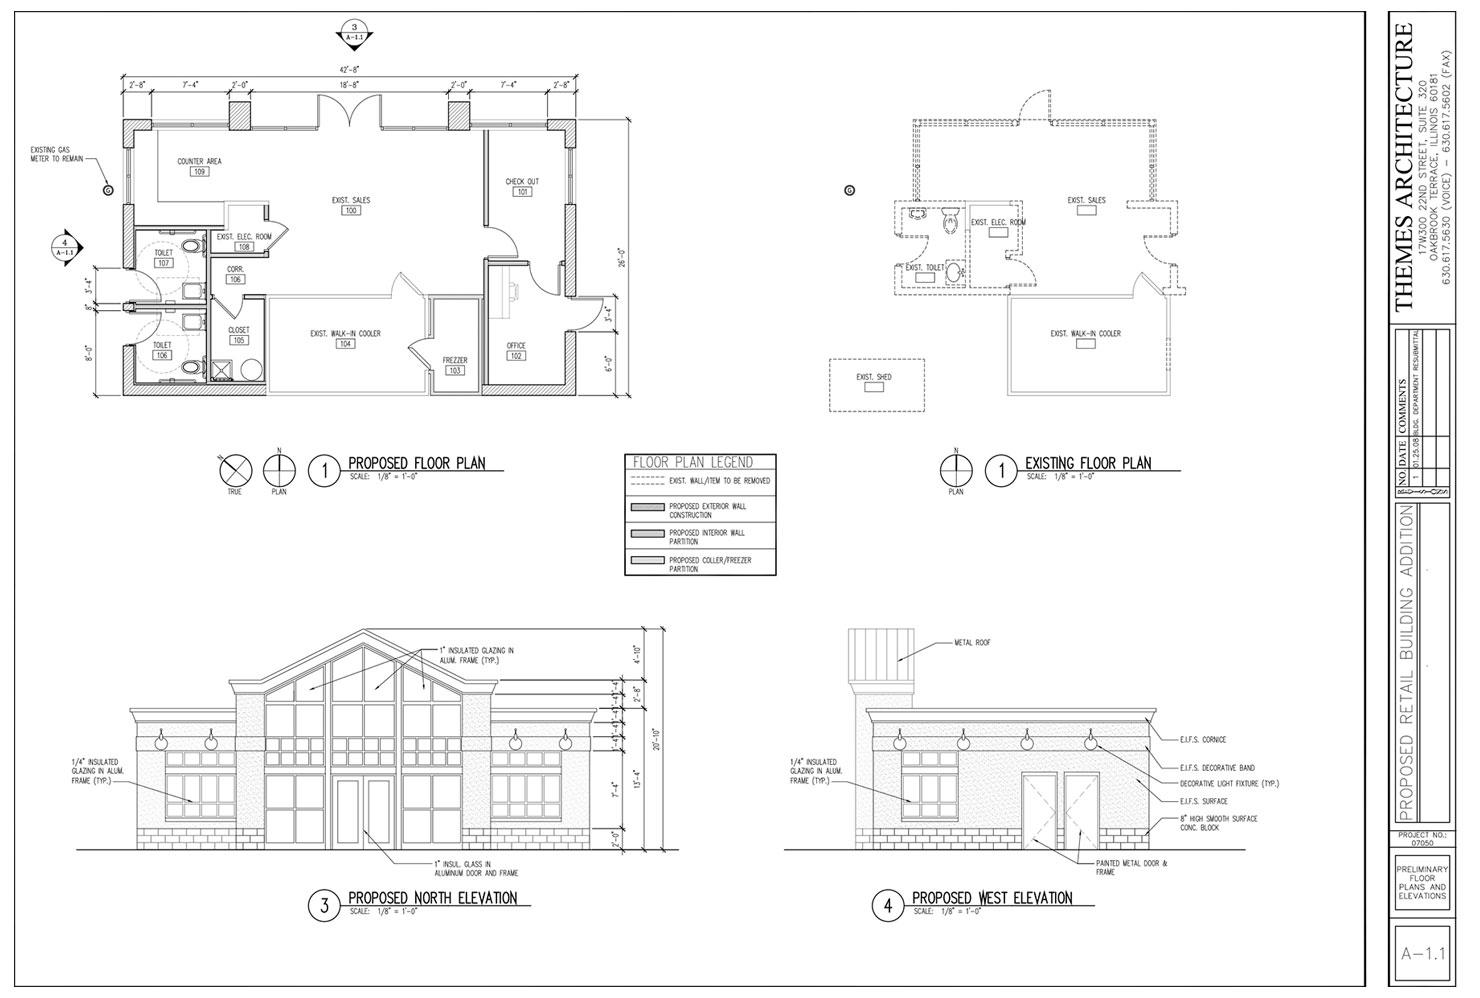 Floorplan of Building